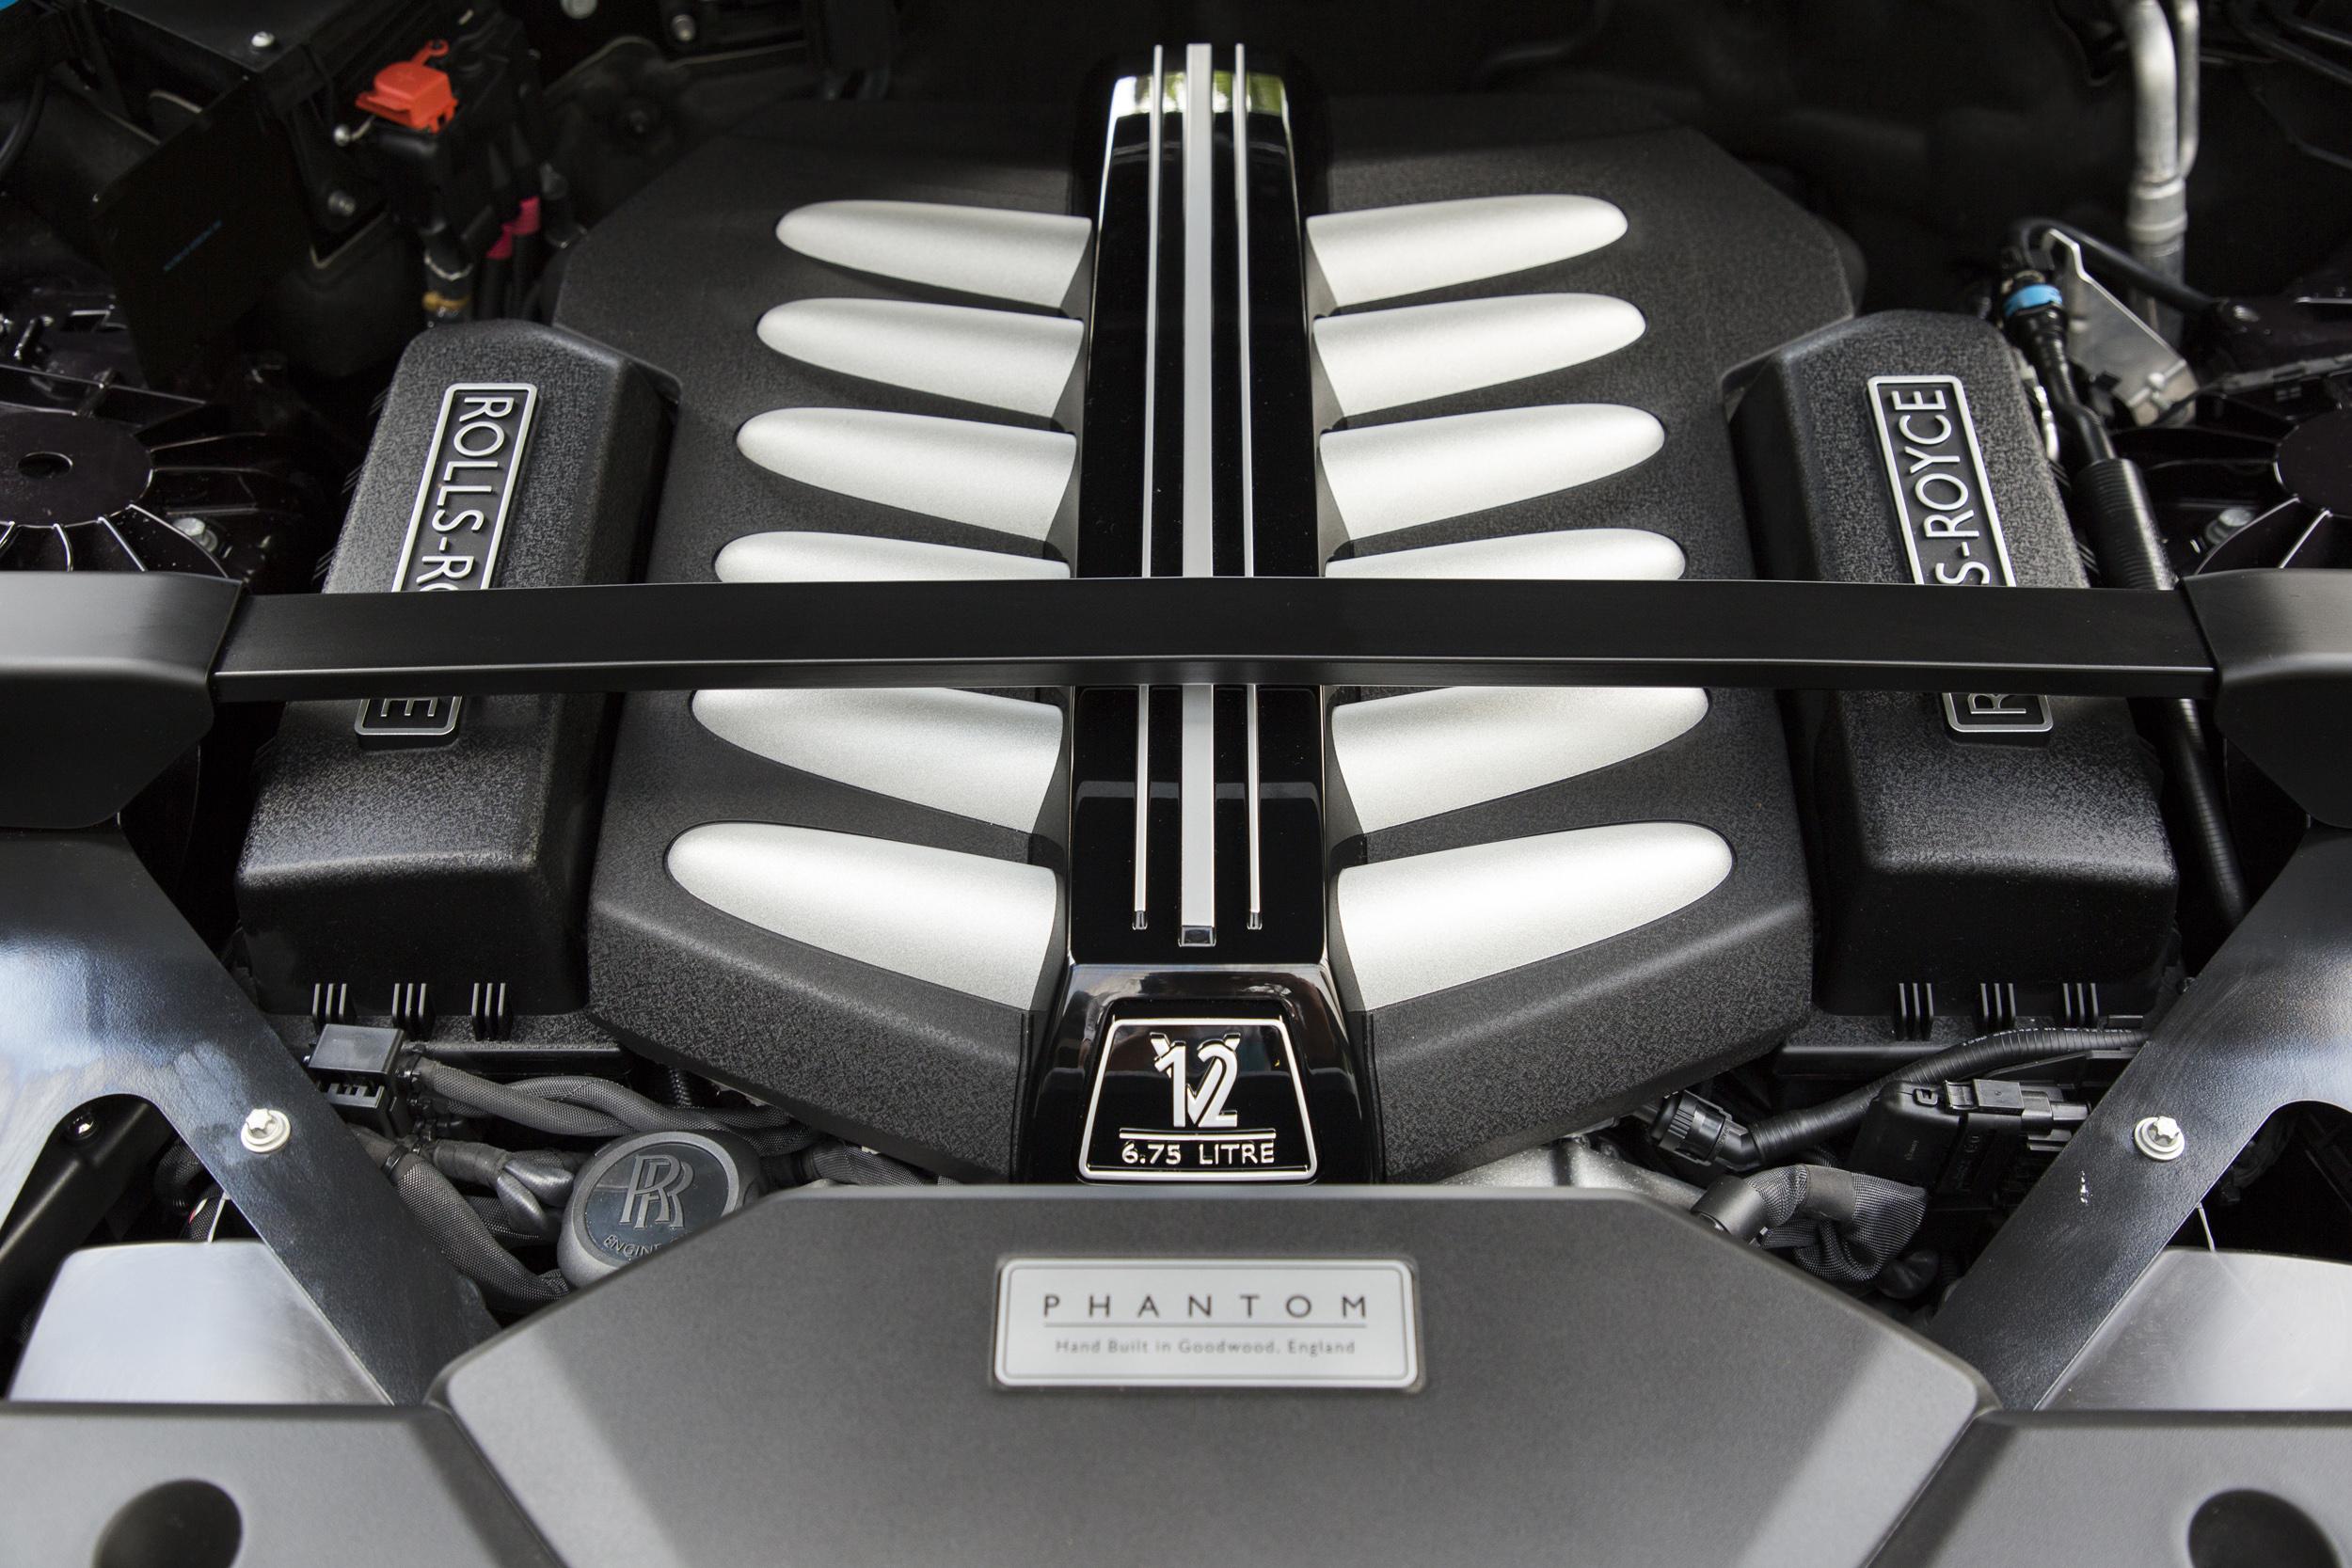 Rolls-Royce Phantom engine